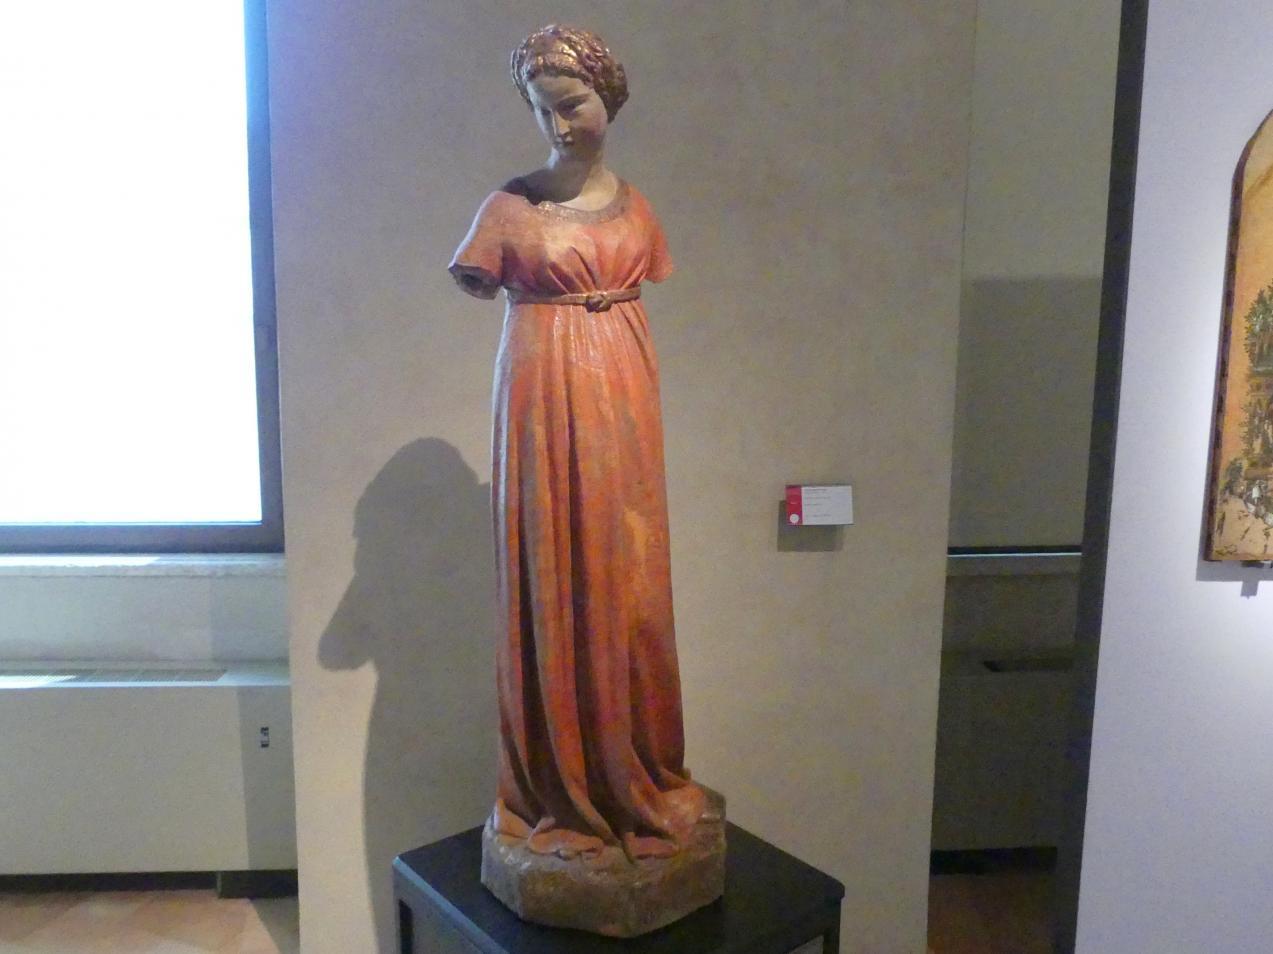 Jacopo della Quercia: Maria aus einer Verkündigung, um 1400 - 1420